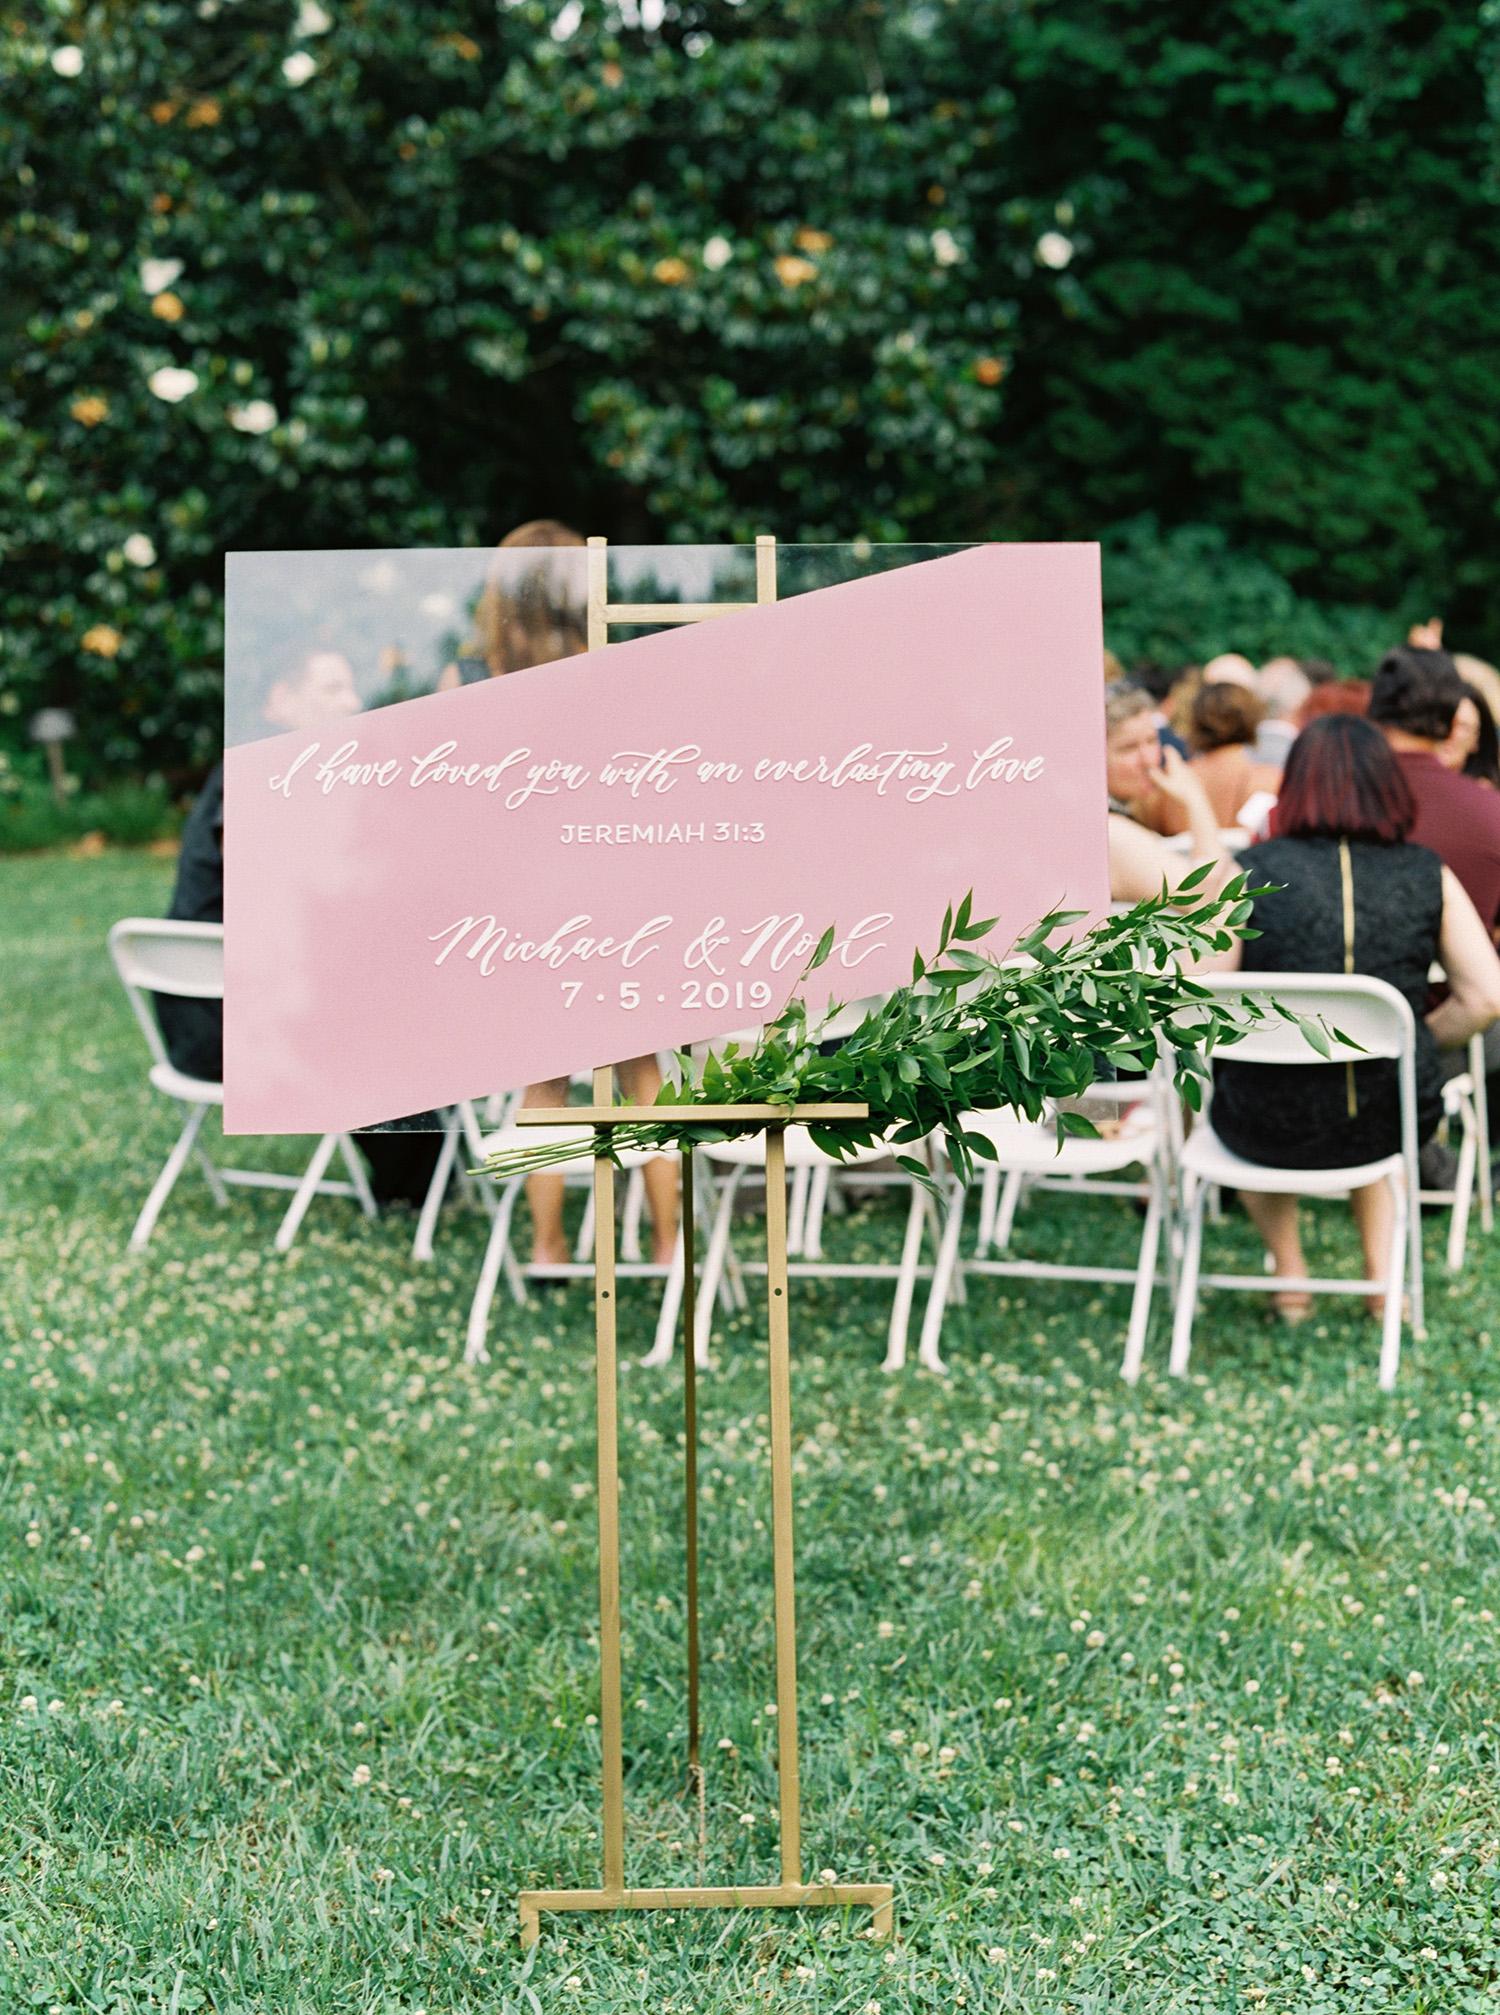 noel mike wedding sign